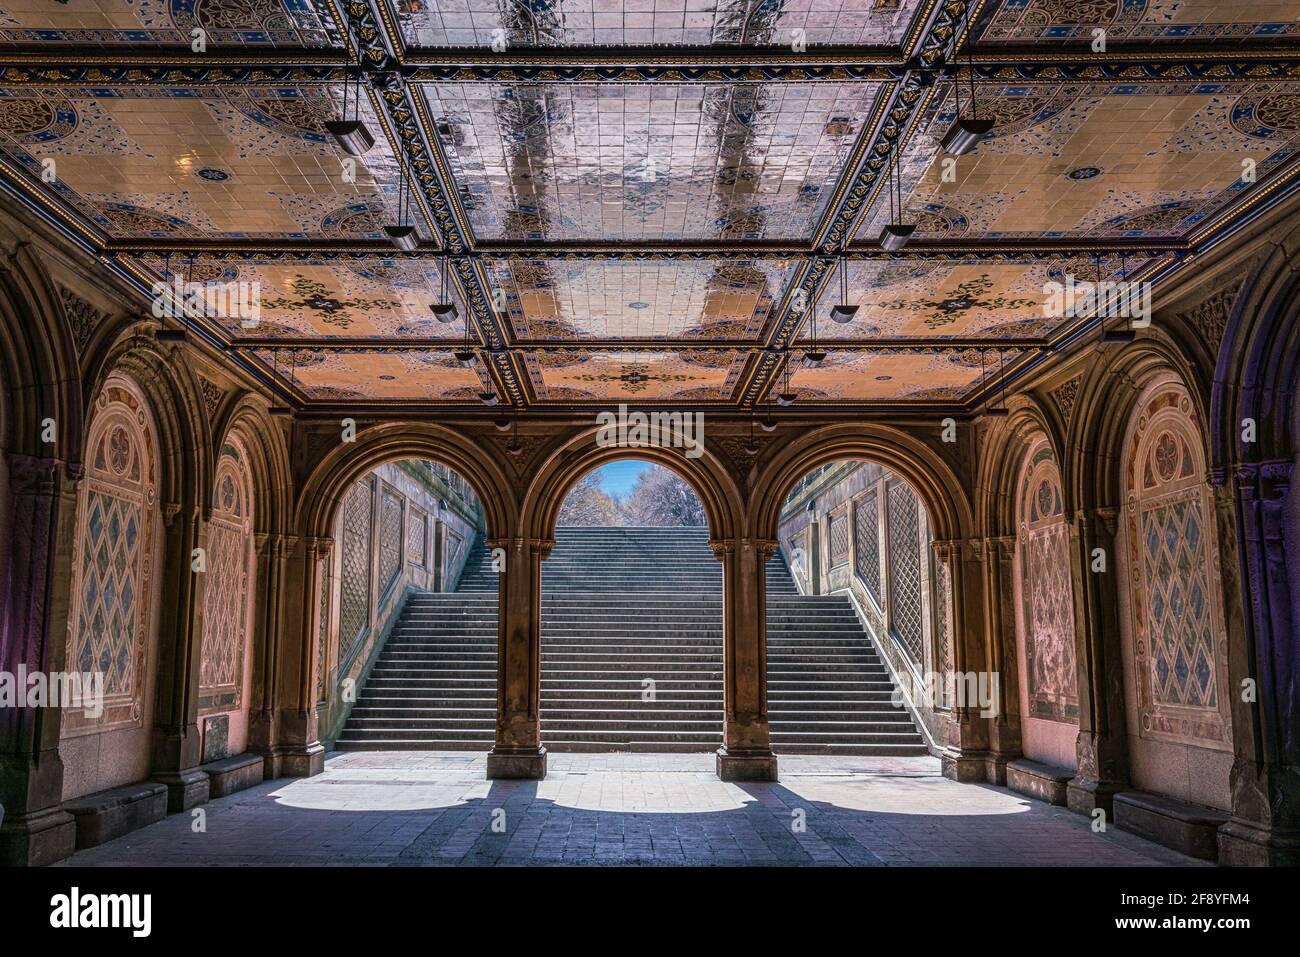 Bethesda Terrace, Central Park, New York City Stockfoto